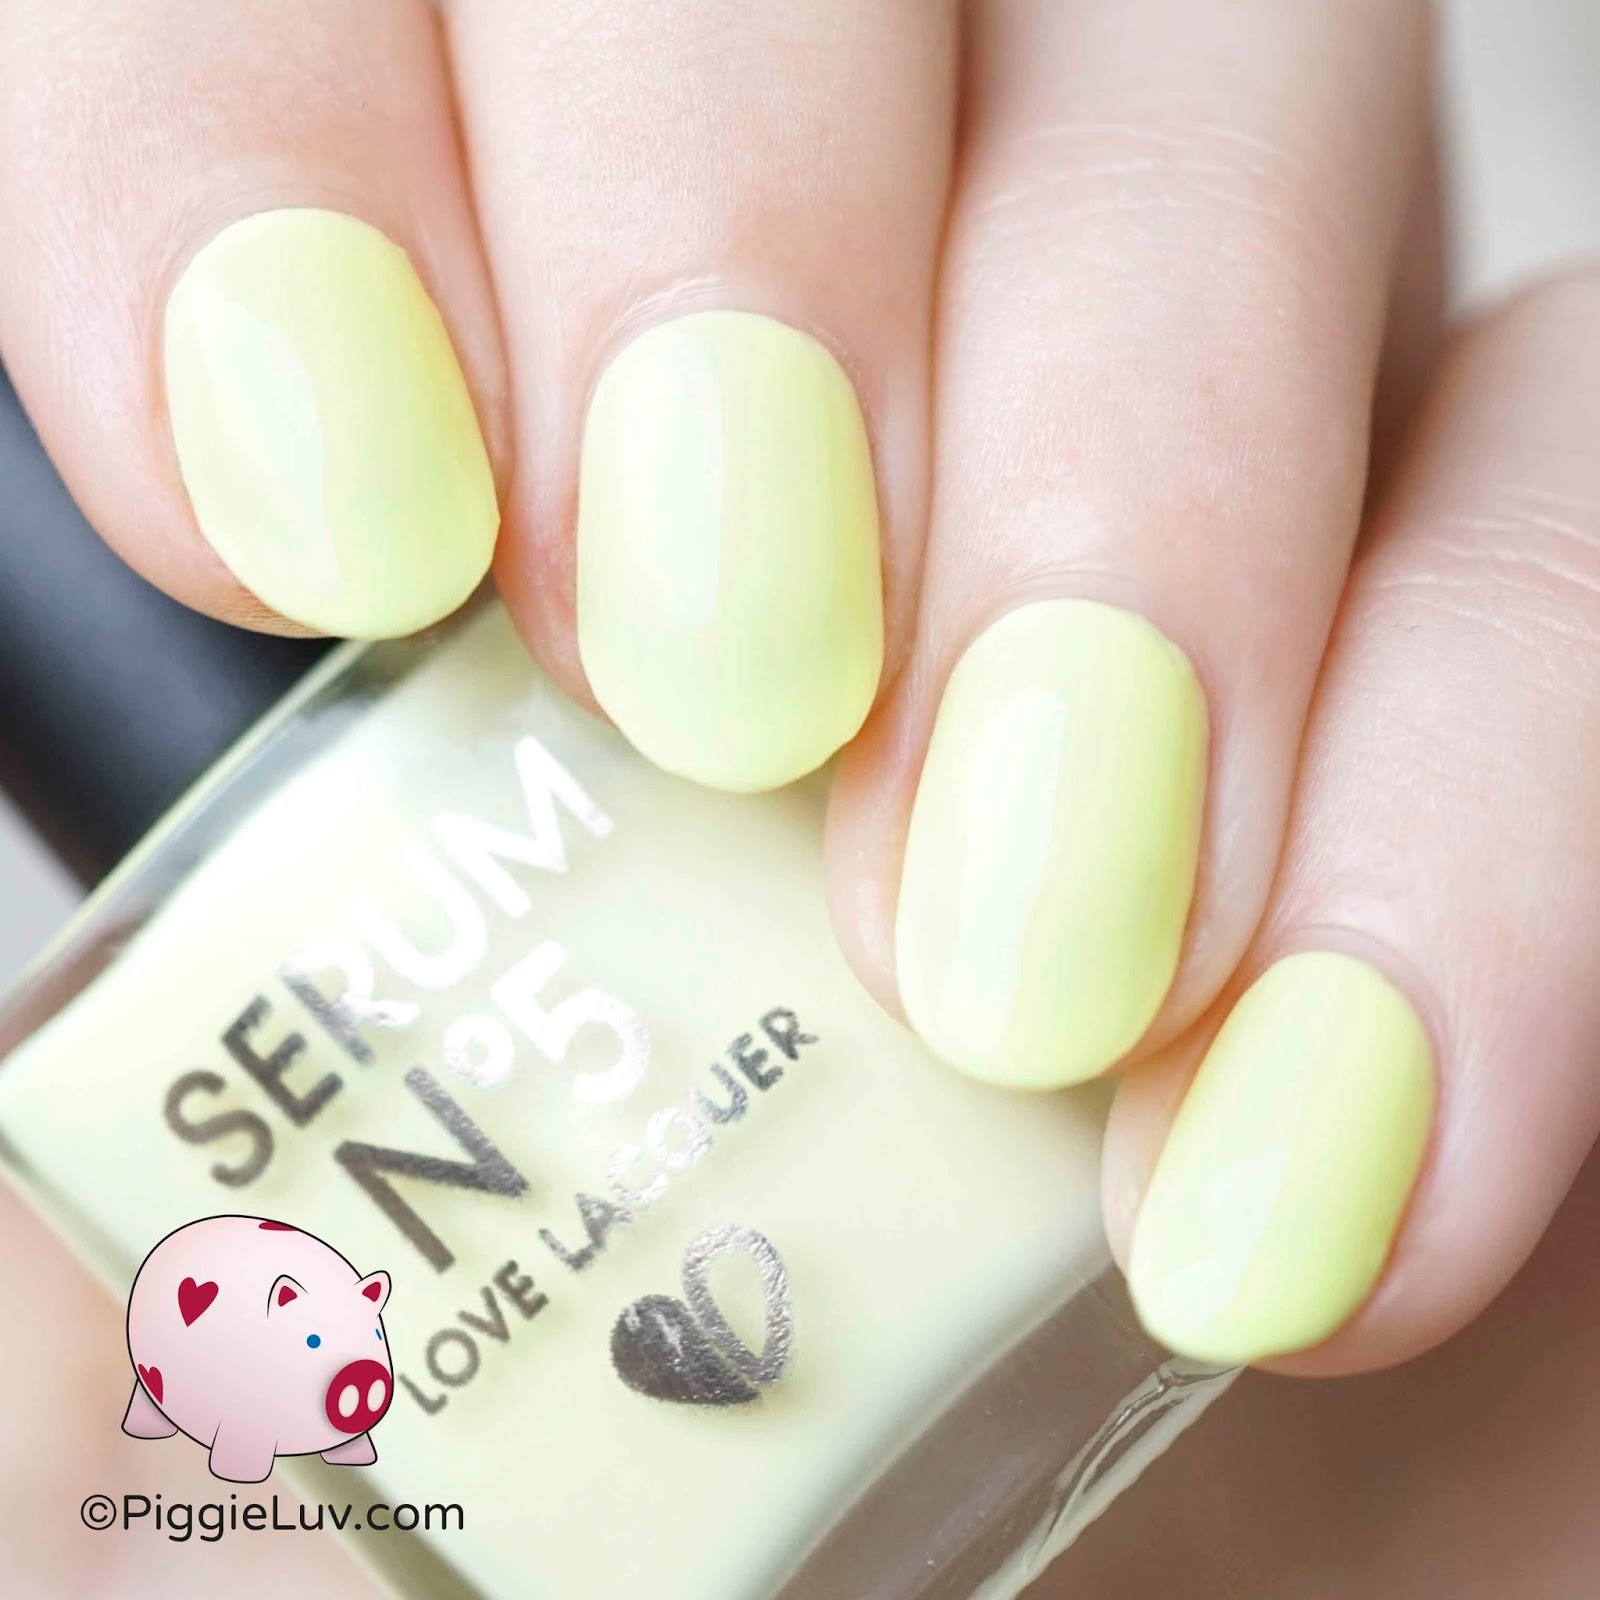 PiggieLuv: Serum No. 5 glow in the dark pastels swatches & review